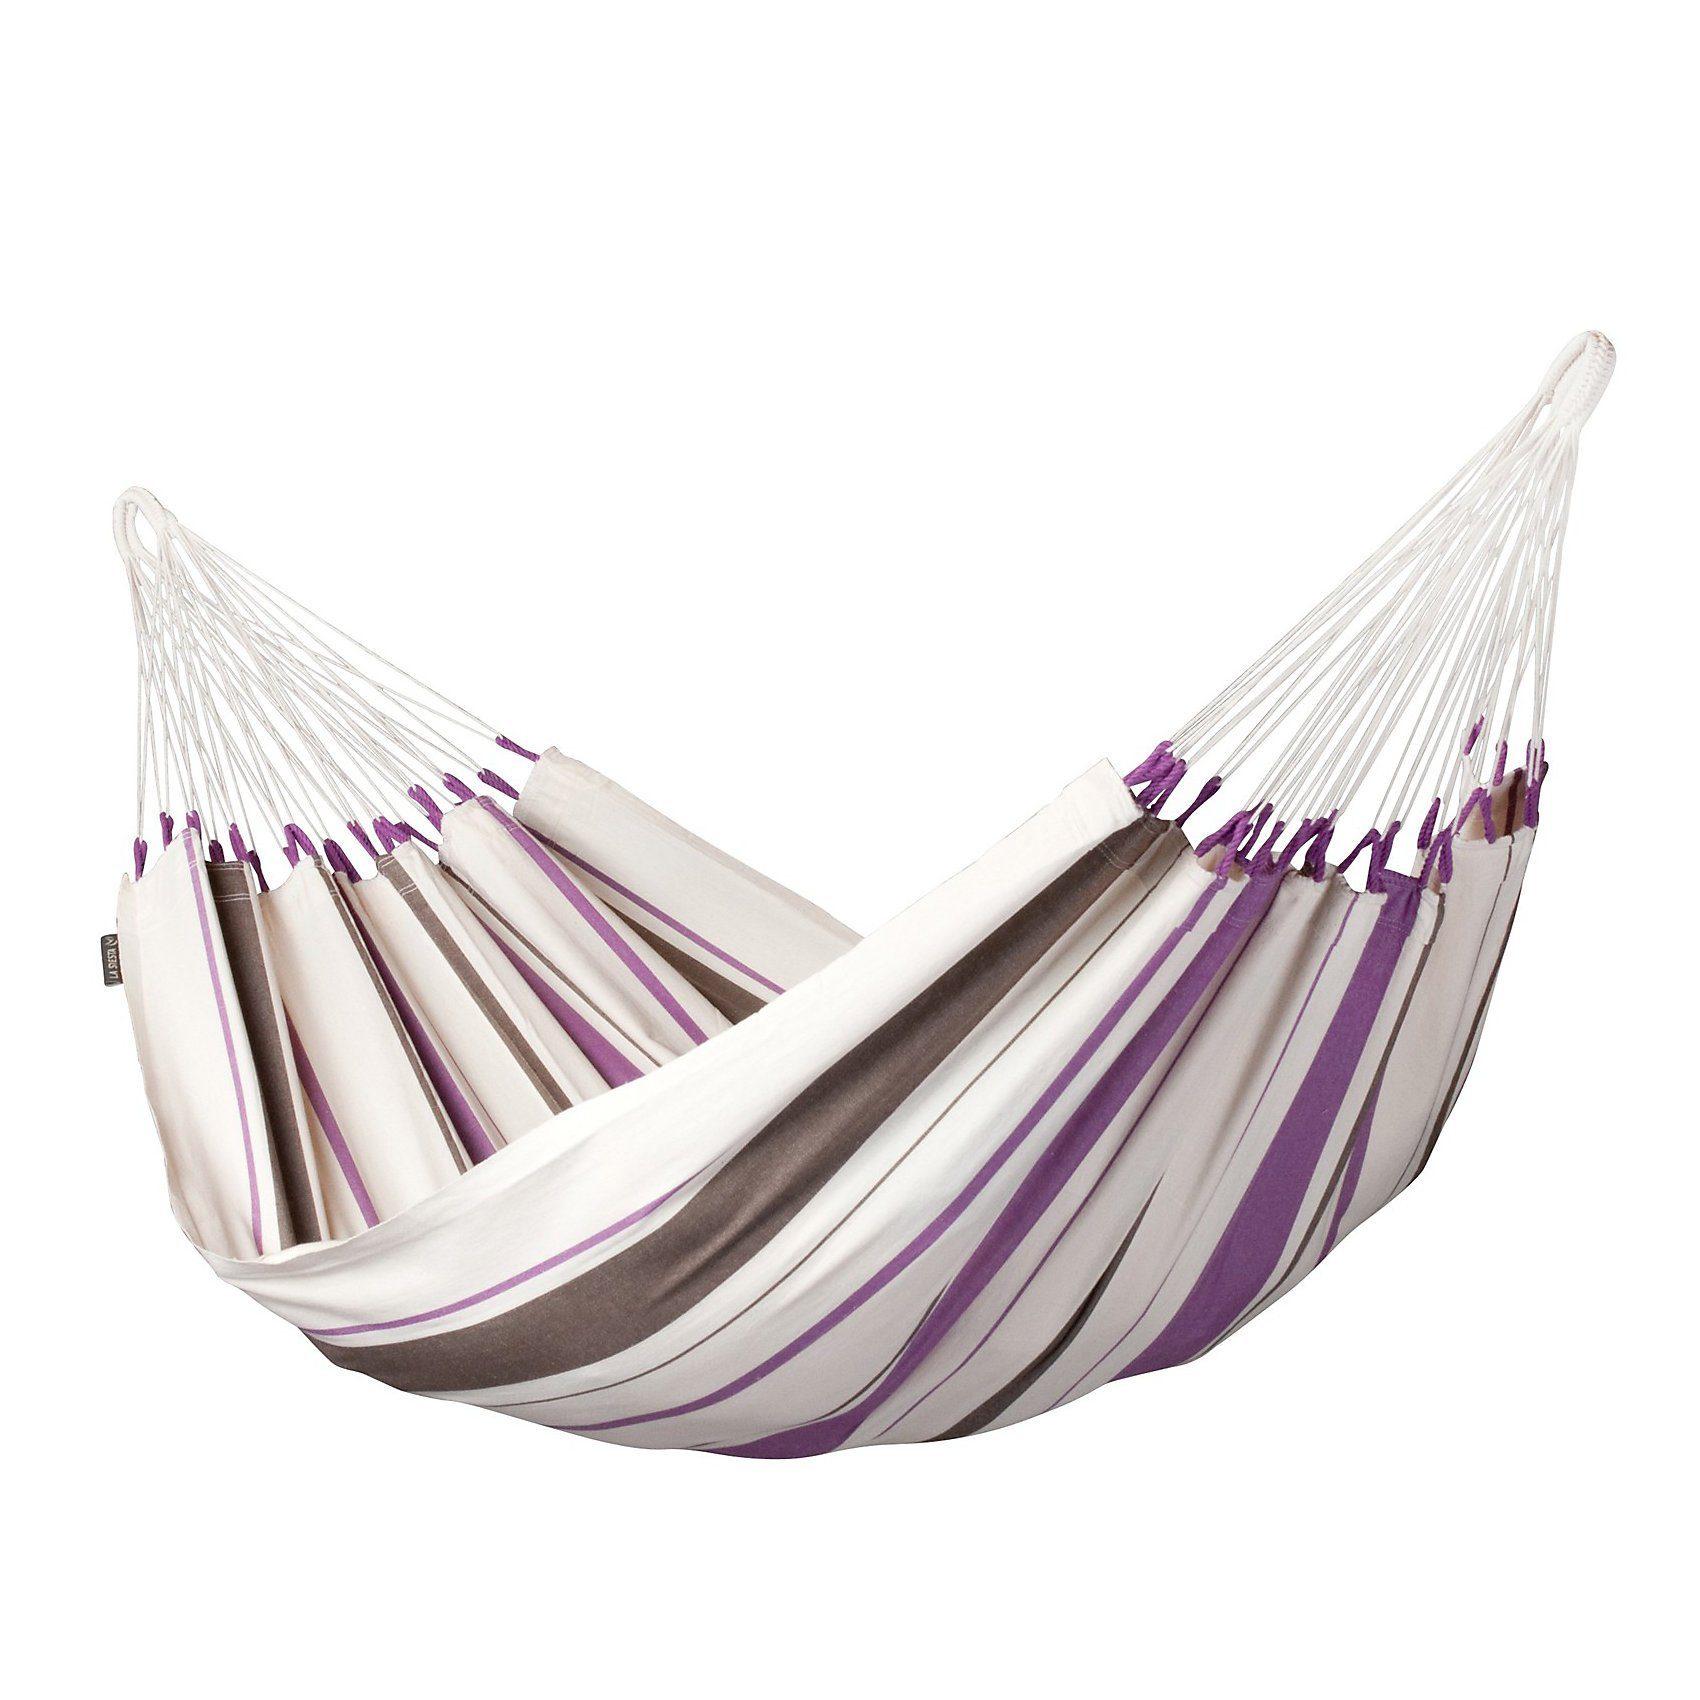 La Siesta Single-Hängematte CARIBEÑA purple